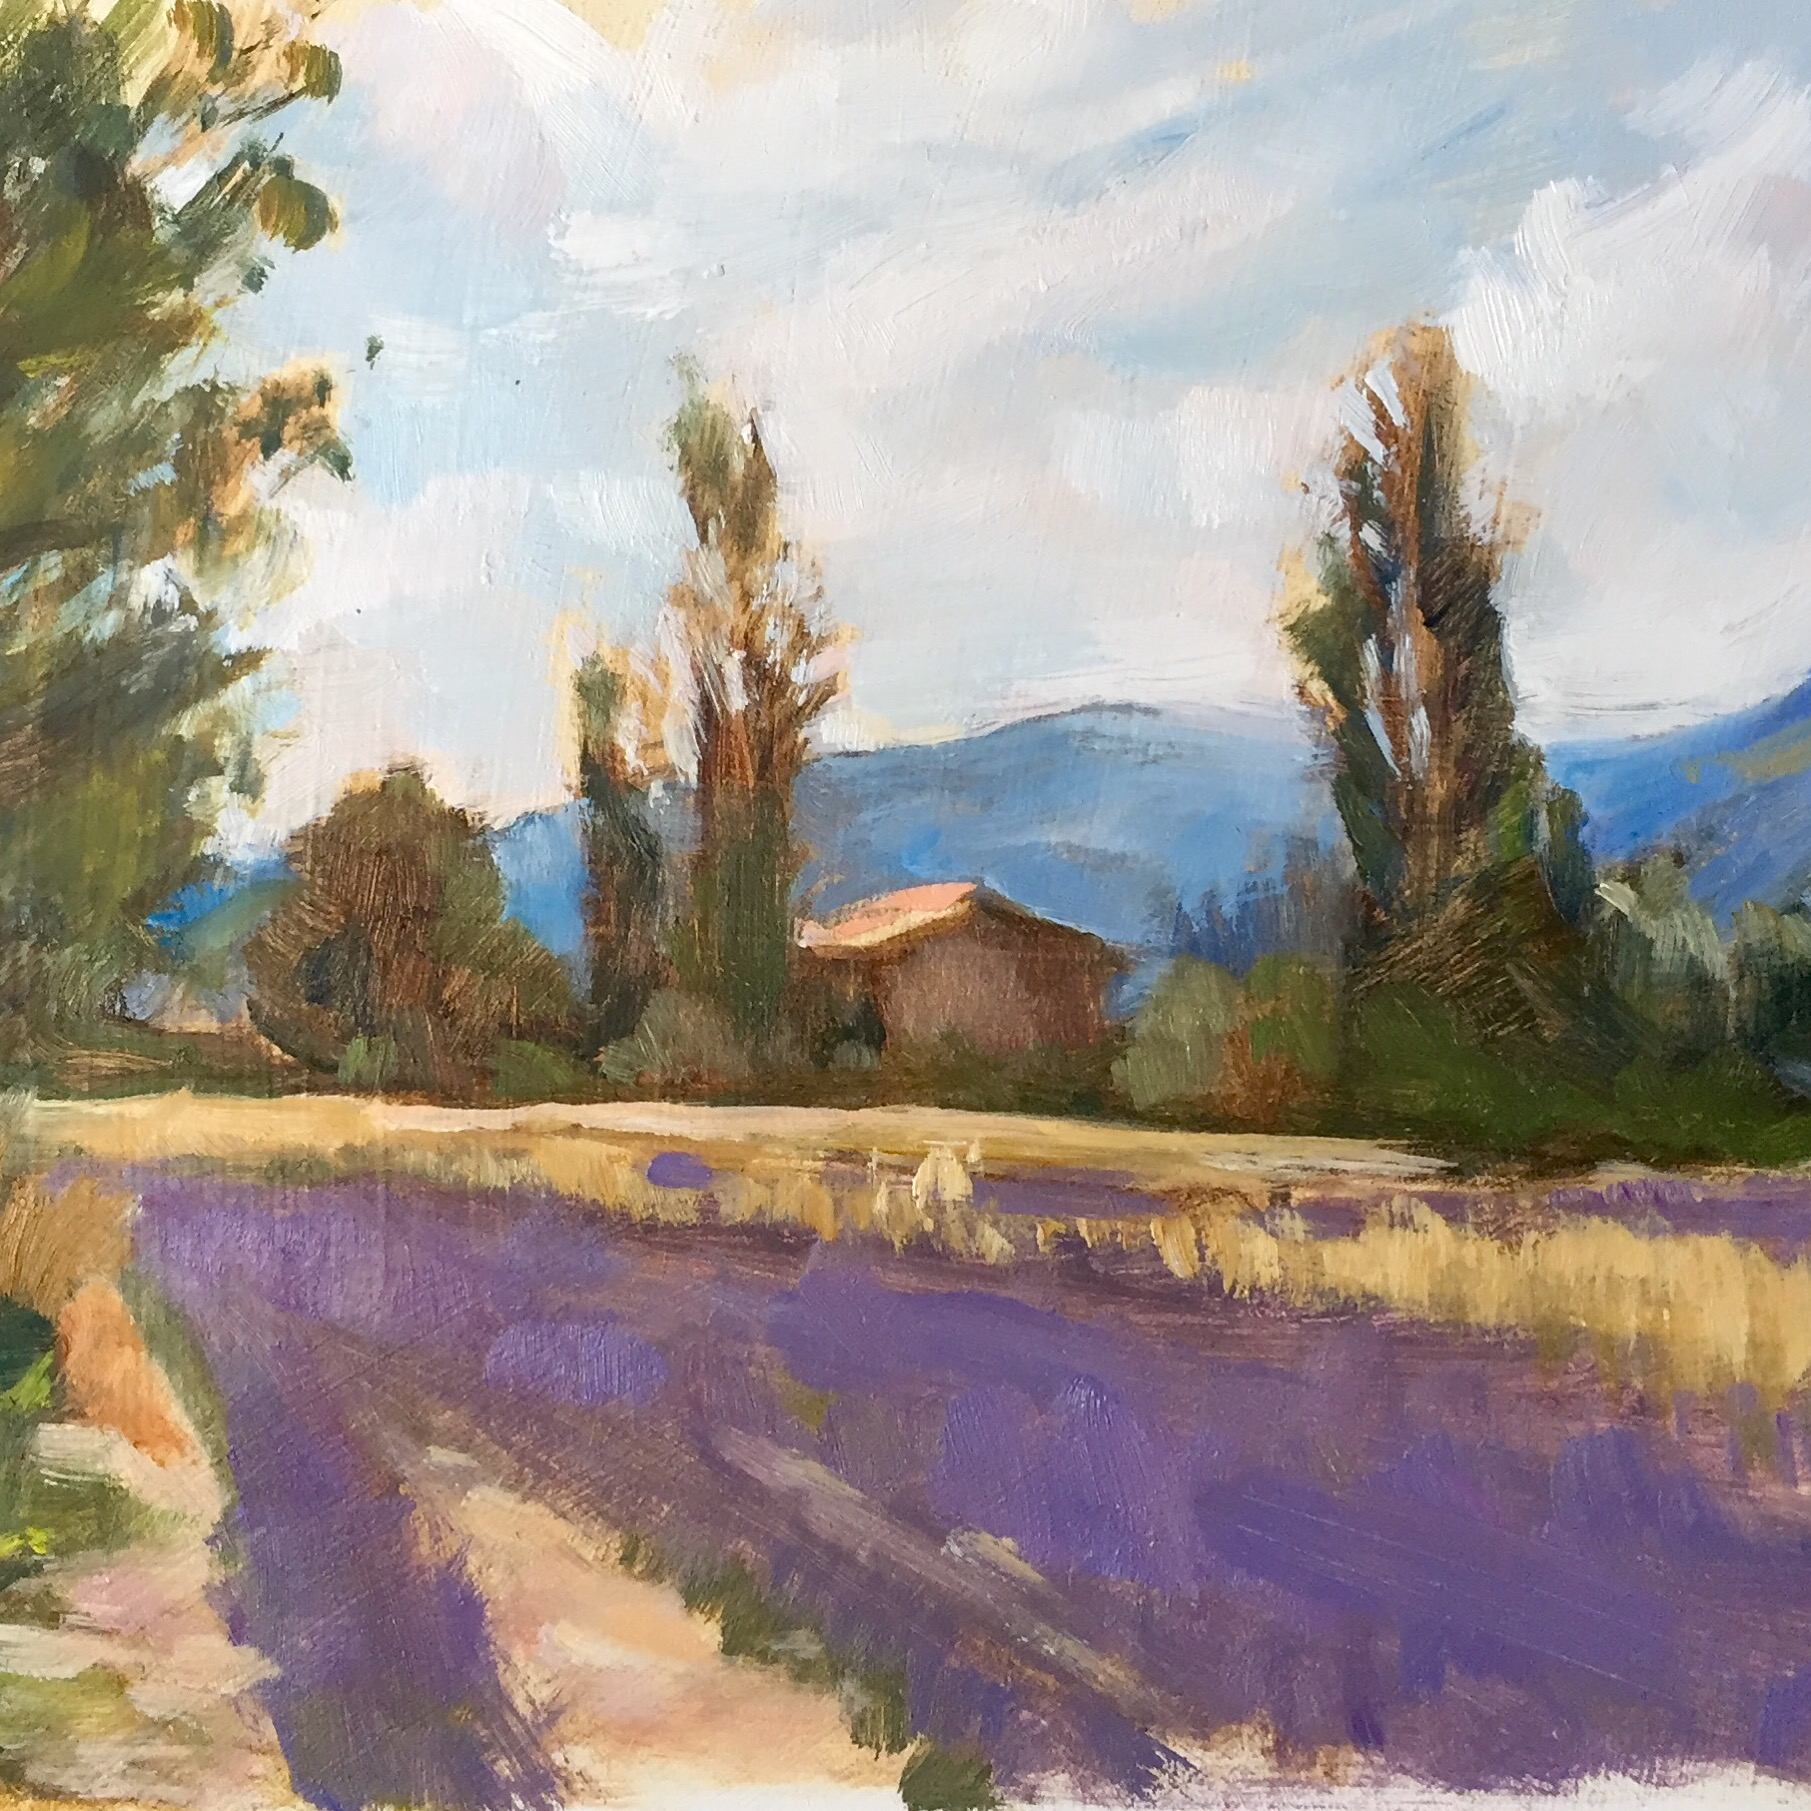 Cabanon in the Lavender Fields, Vallée de Sault